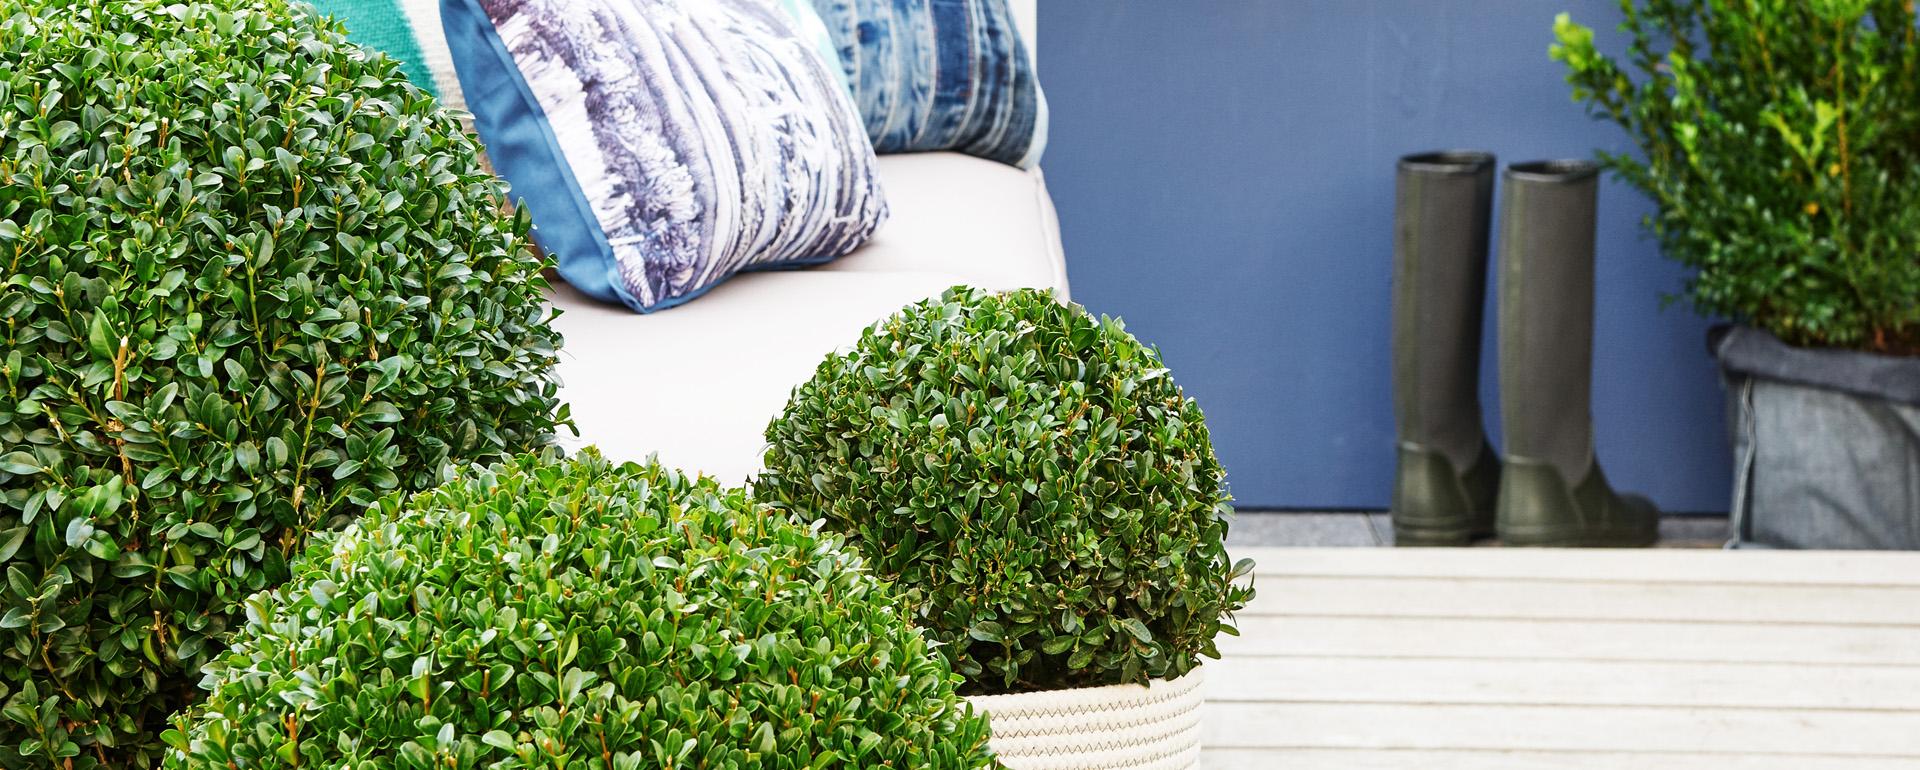 buxus jeans of garden home